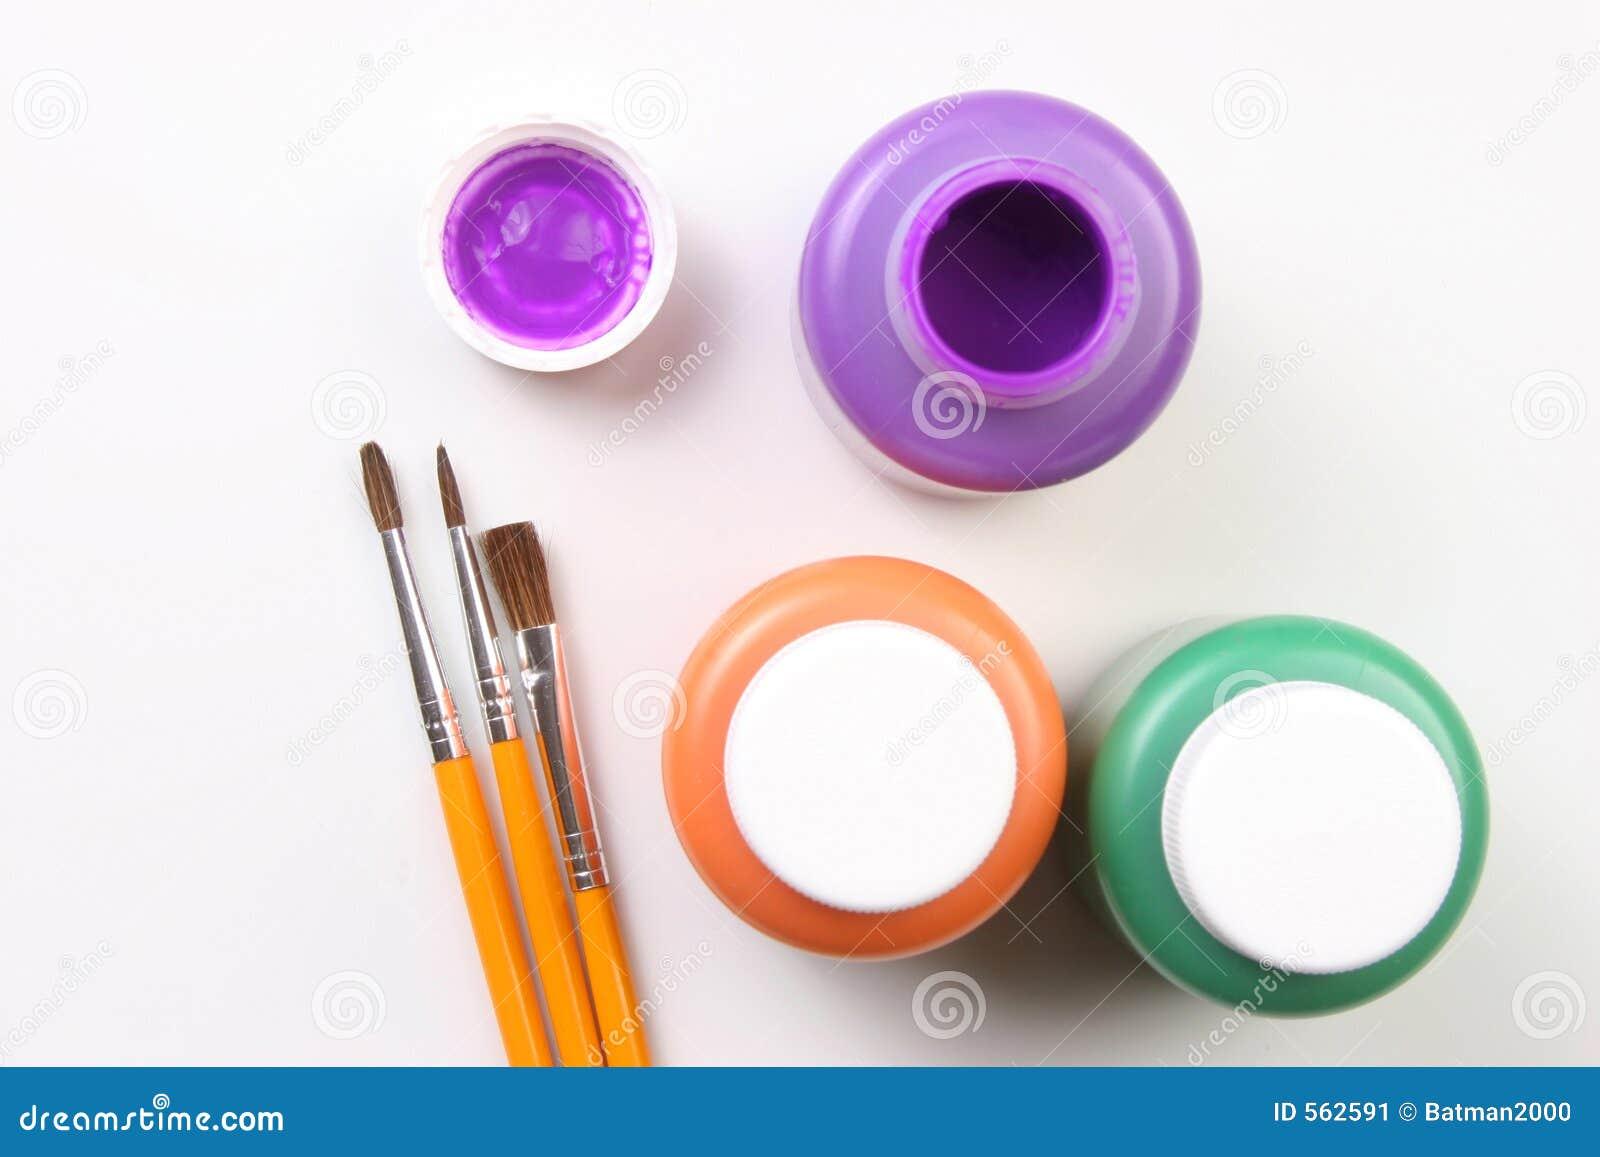 Kids artistic expressions-purple